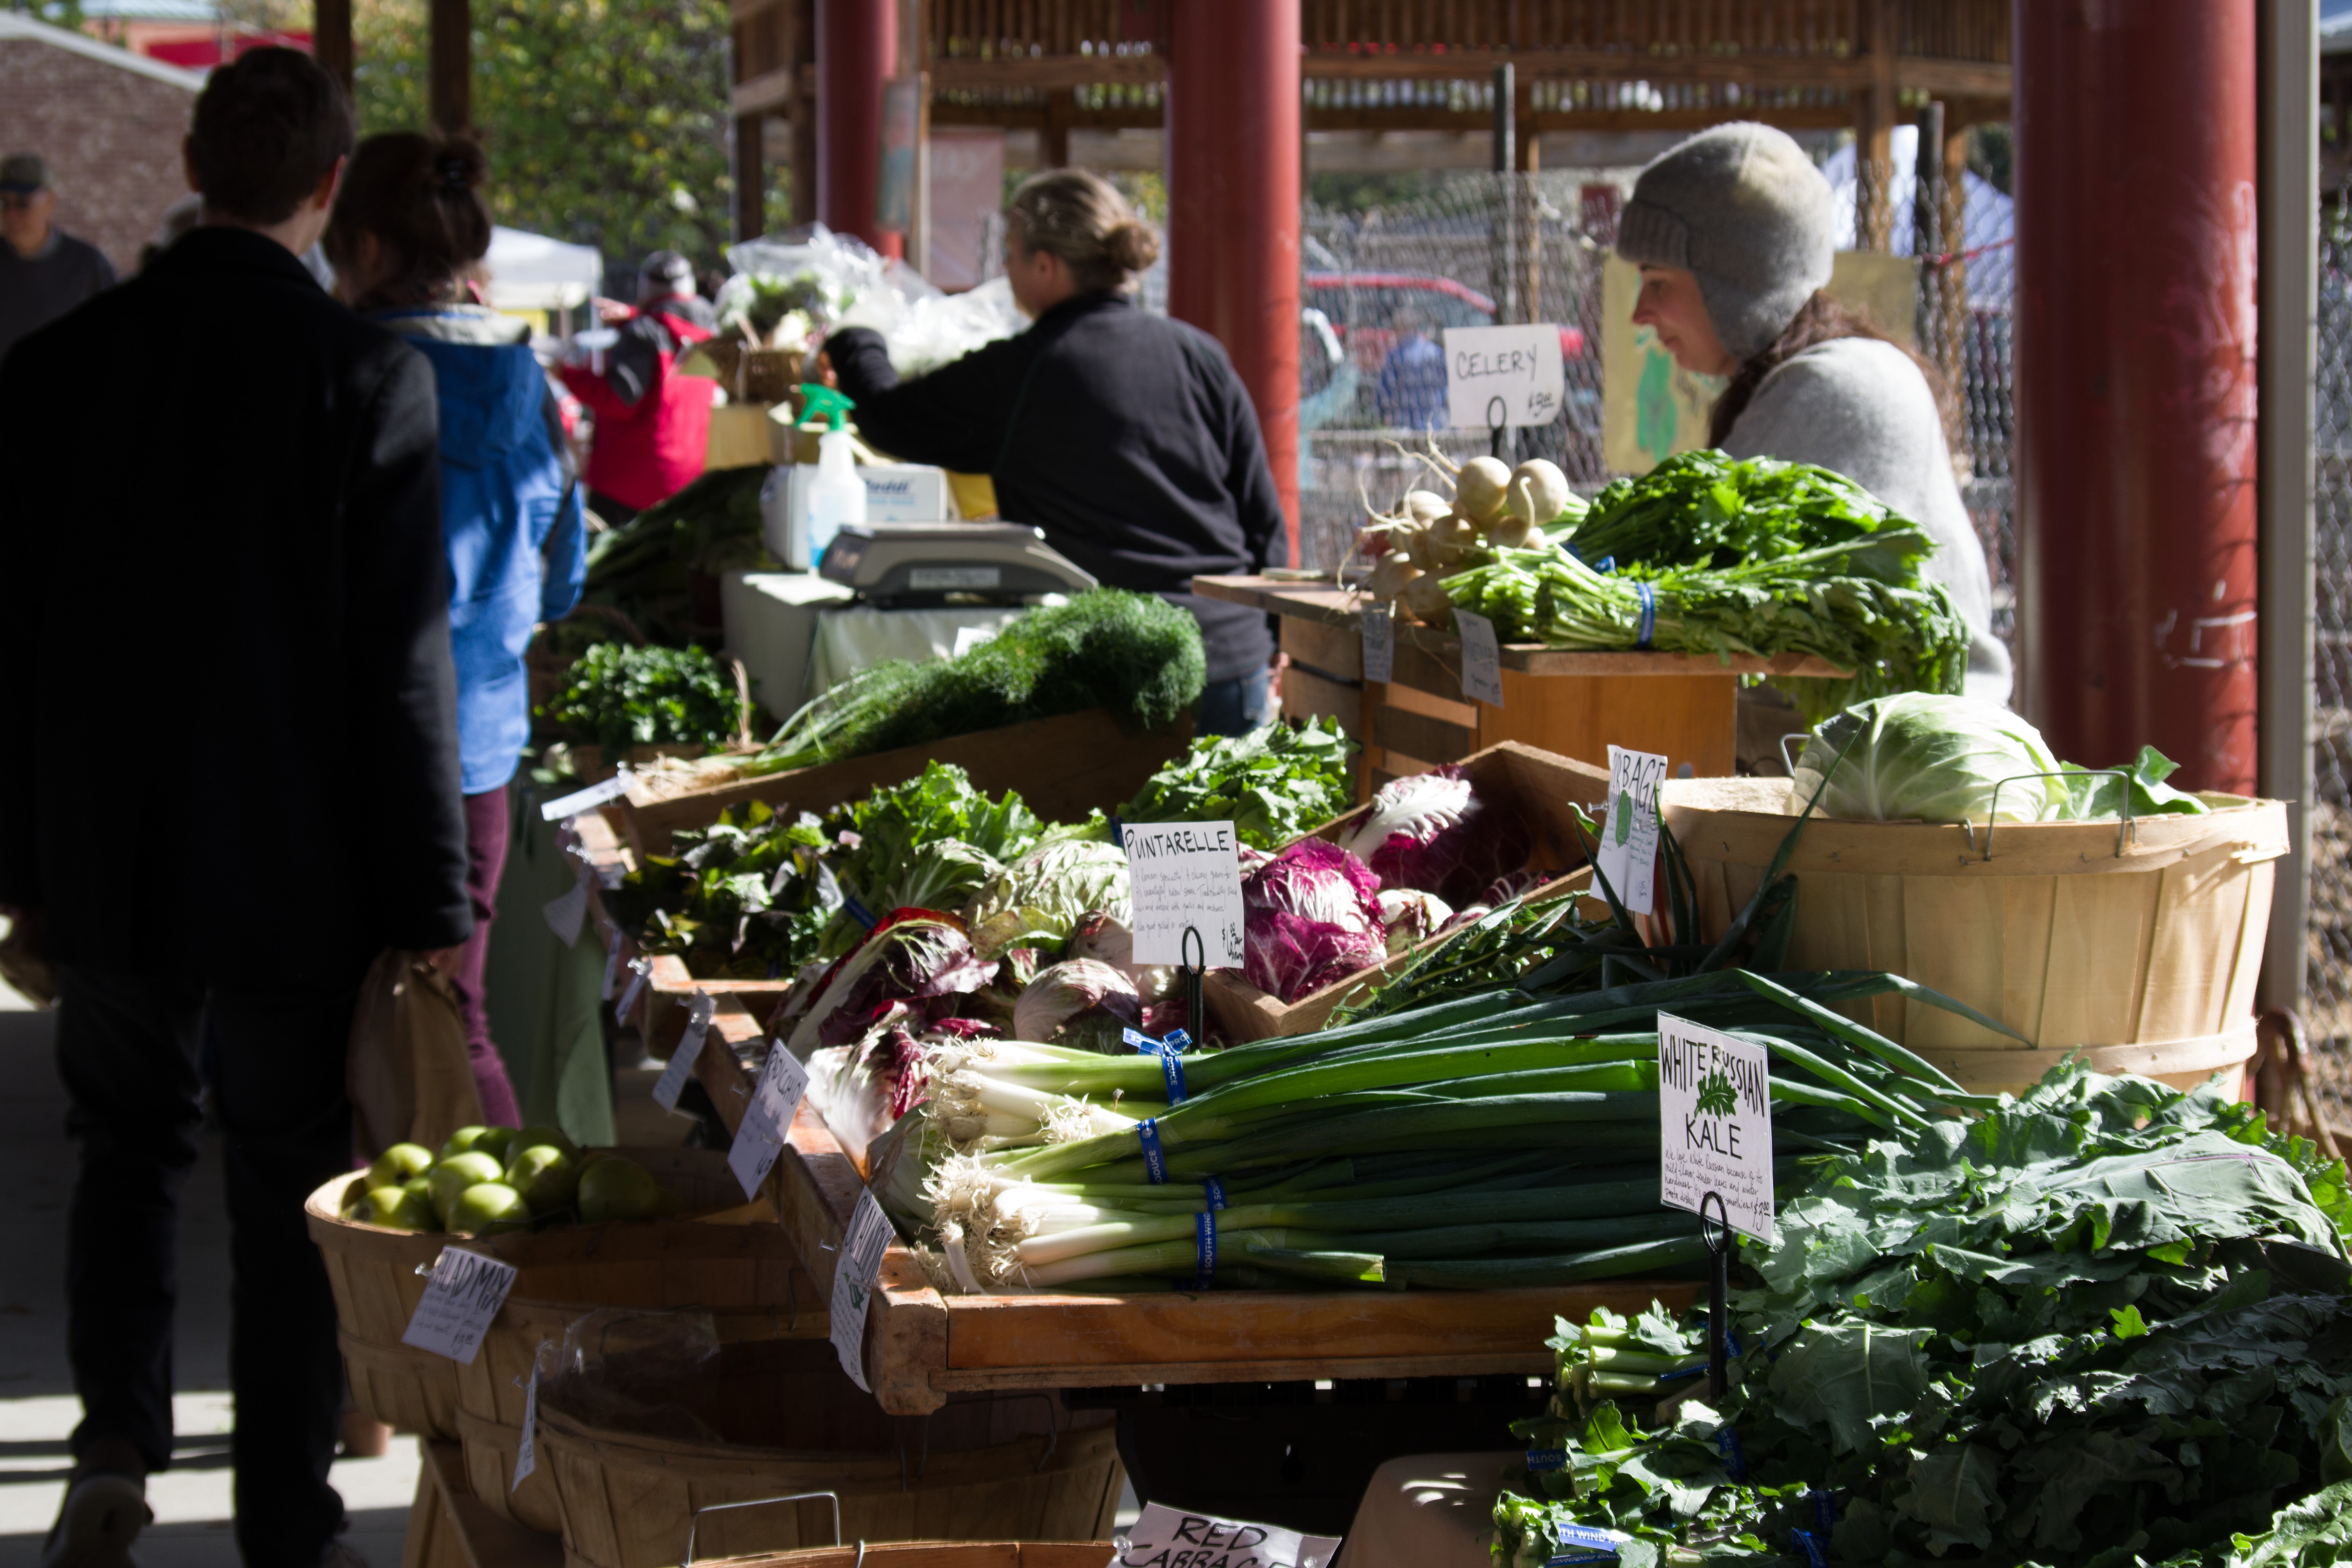 Shoppers, vendors, and fresh produce at a Farmer's Market. Photo © Jillian Regan 2017